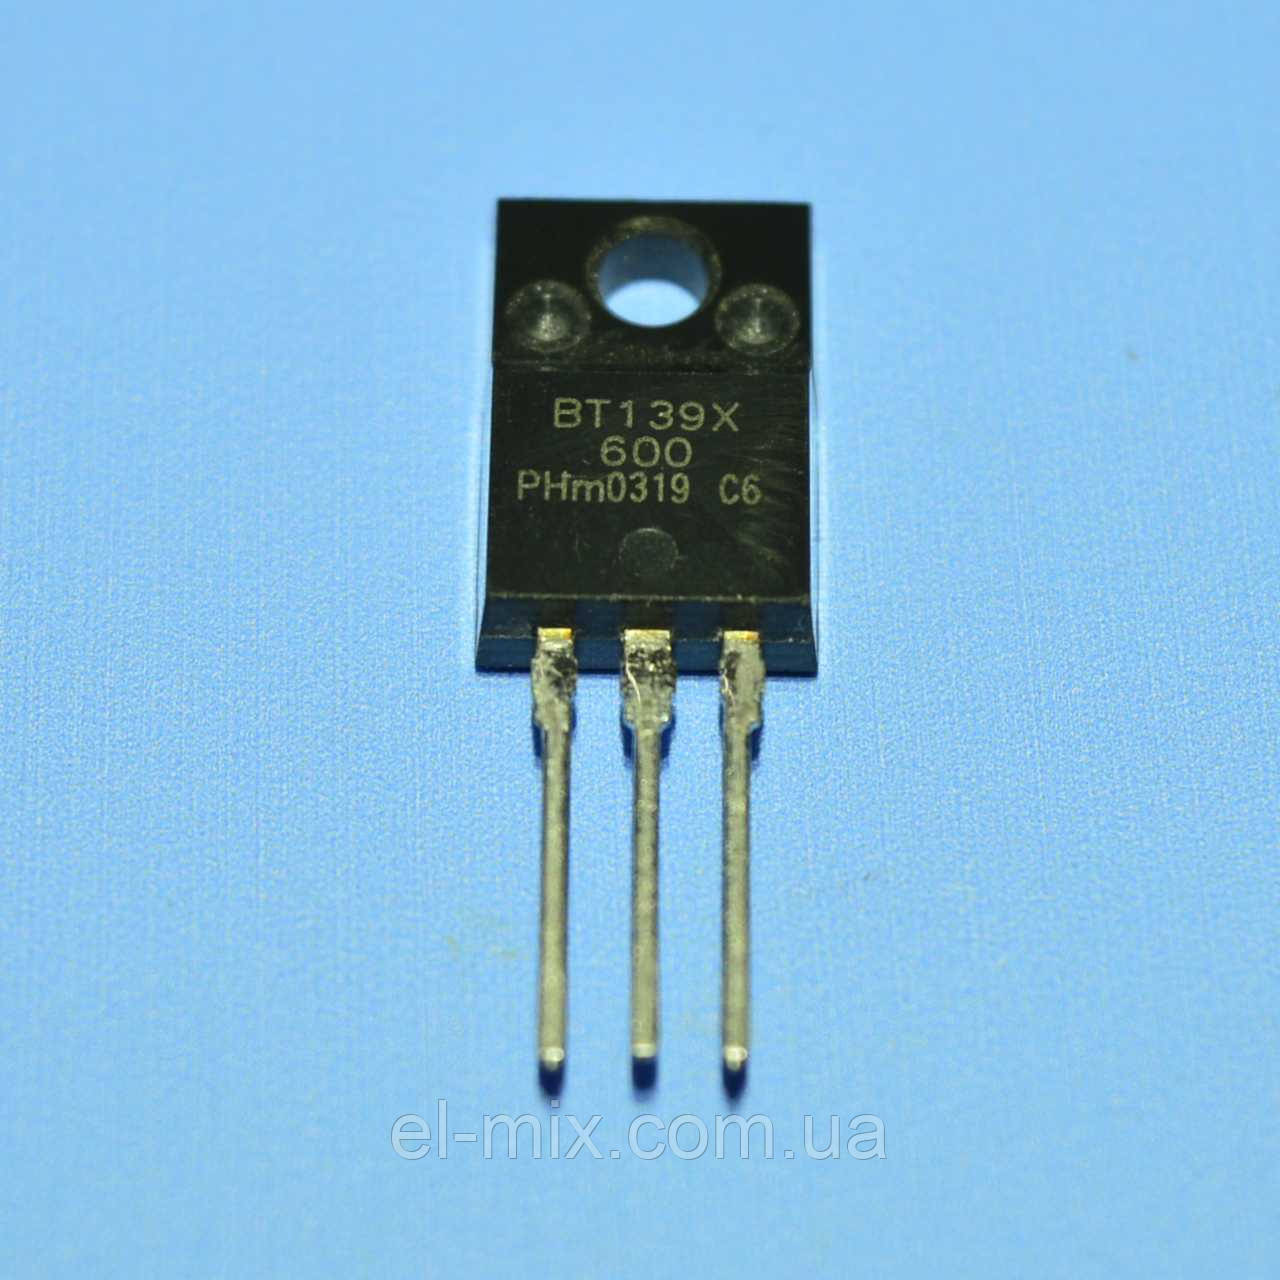 Симистор BT139X-600  TO-220F  Philips